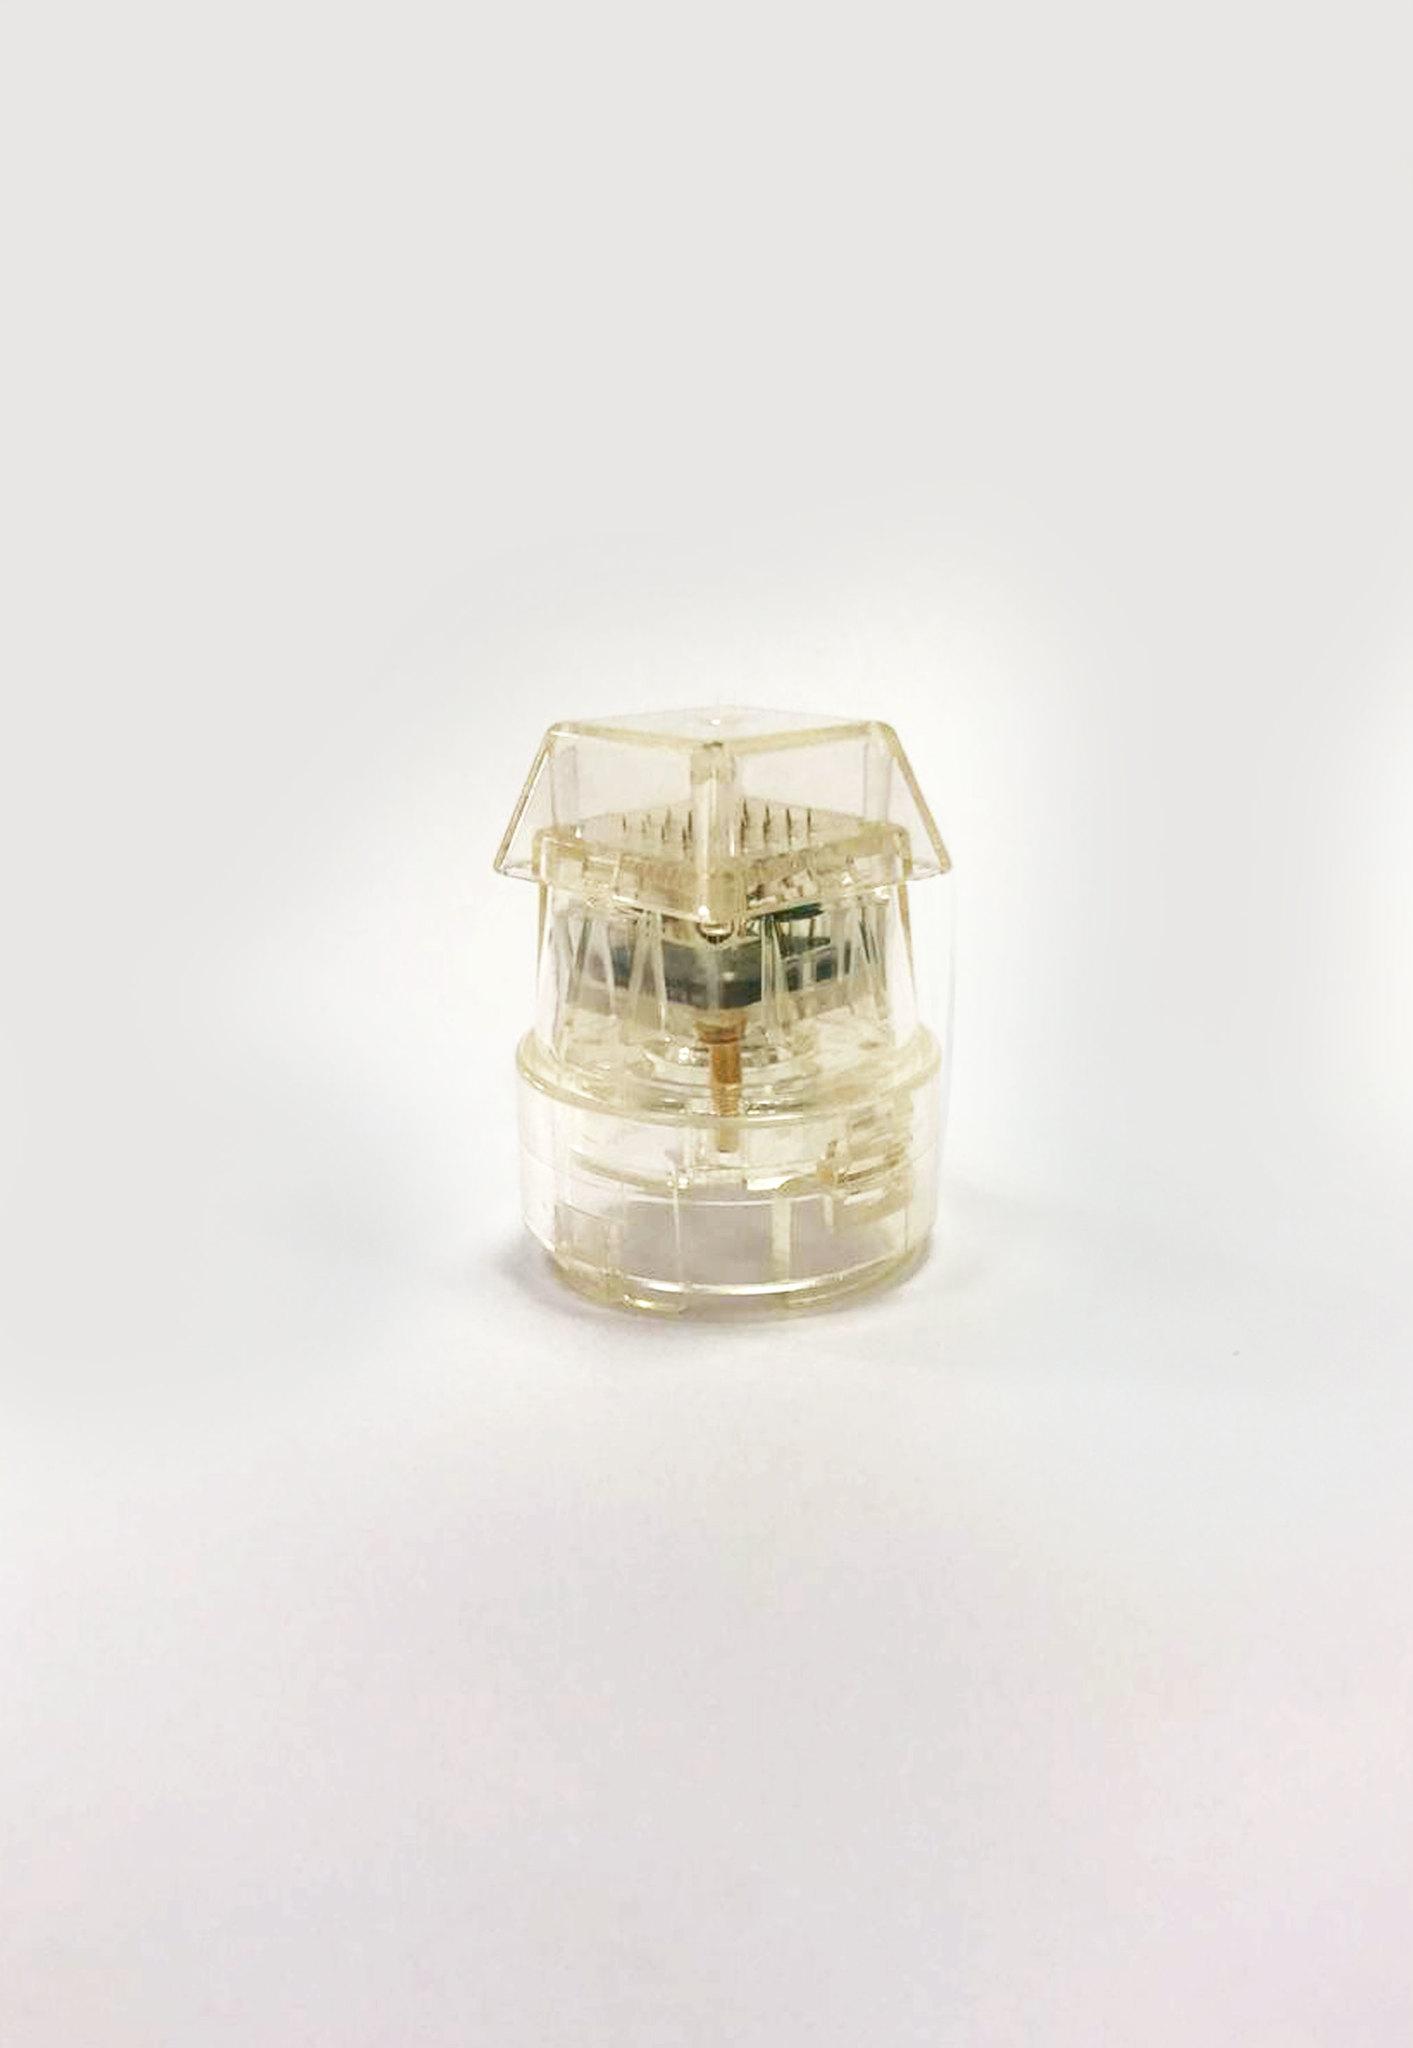 SCARLET RF Tip-GSF Насадки с микроиглами RF